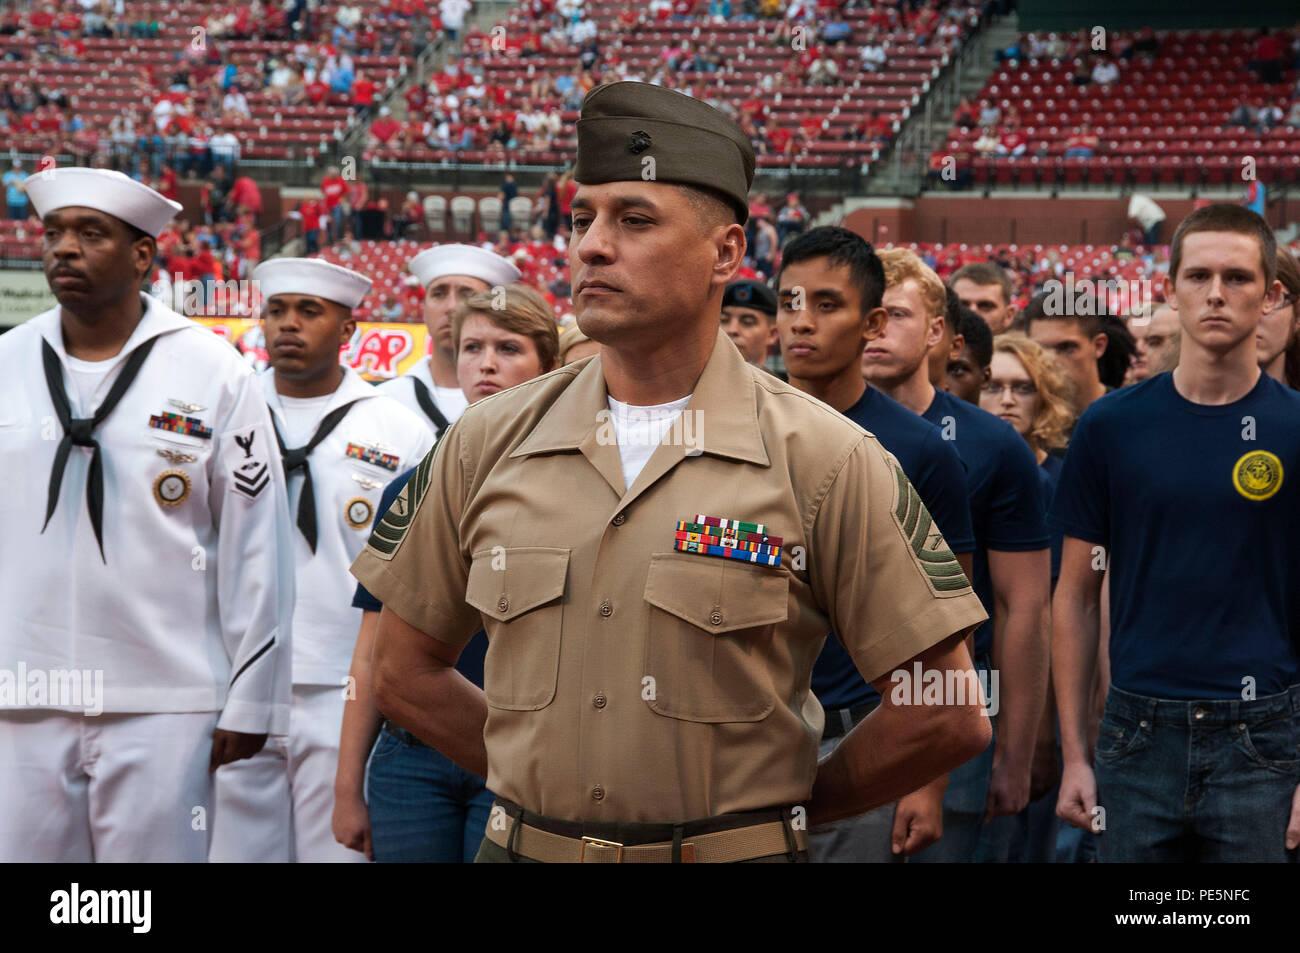 150926-N-II118-033 ST  LOUIS (Sept  26, 2015) – Master Sgt